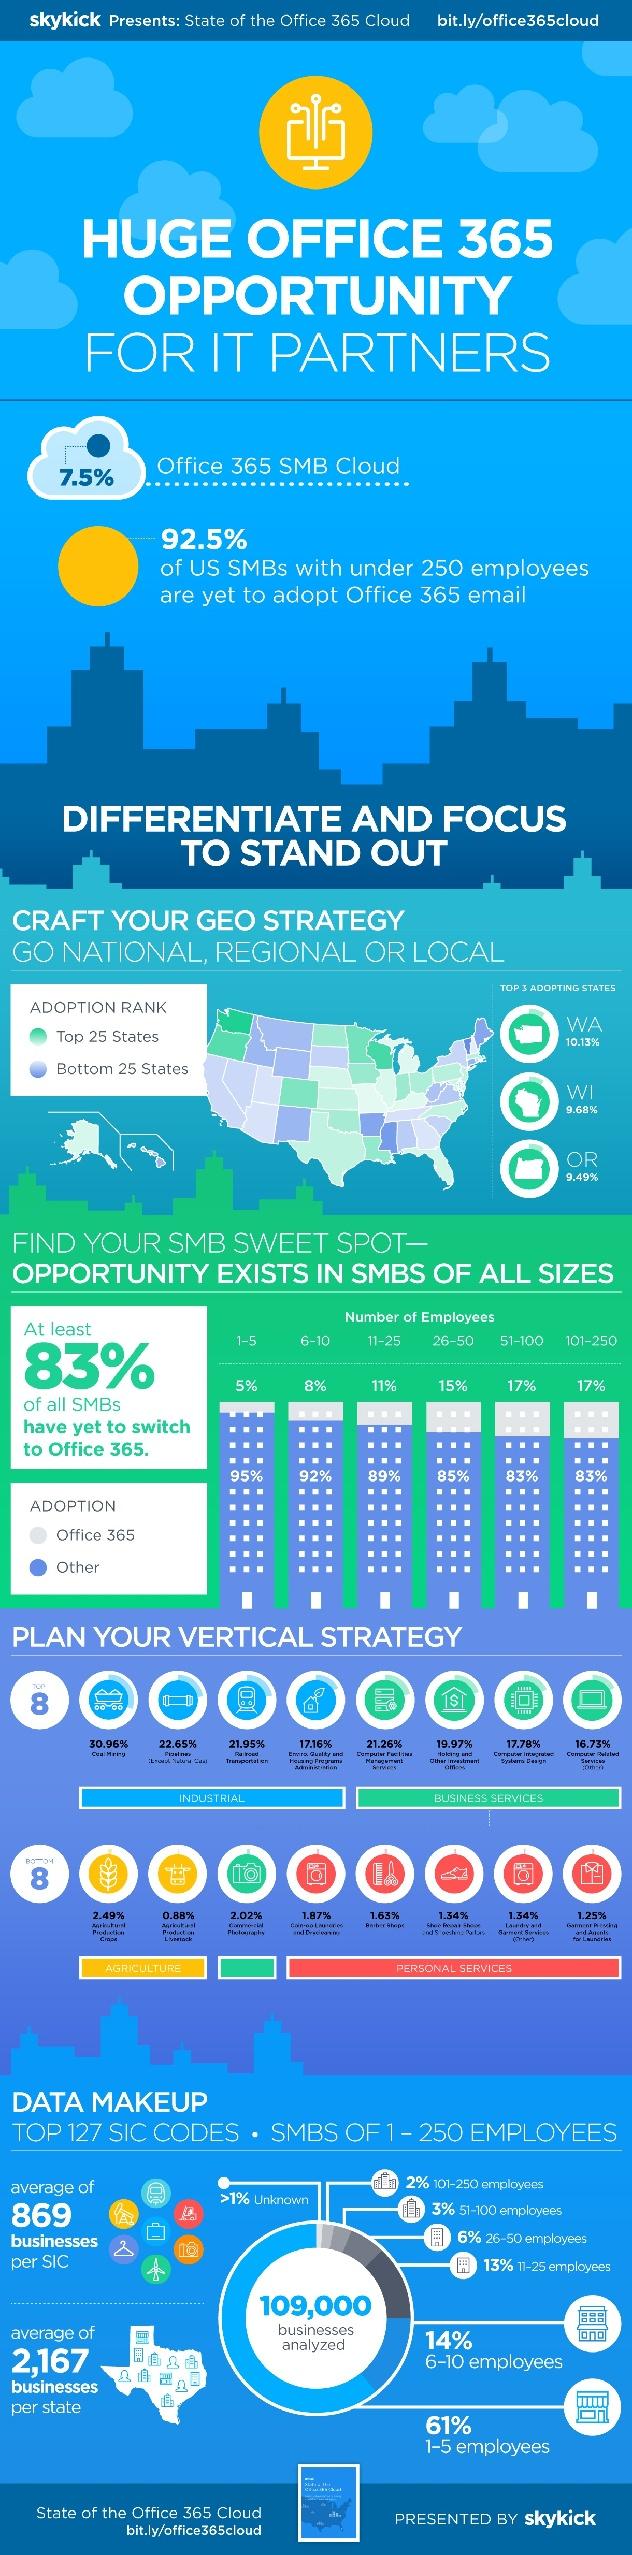 SkyKick_Office365_Infographic